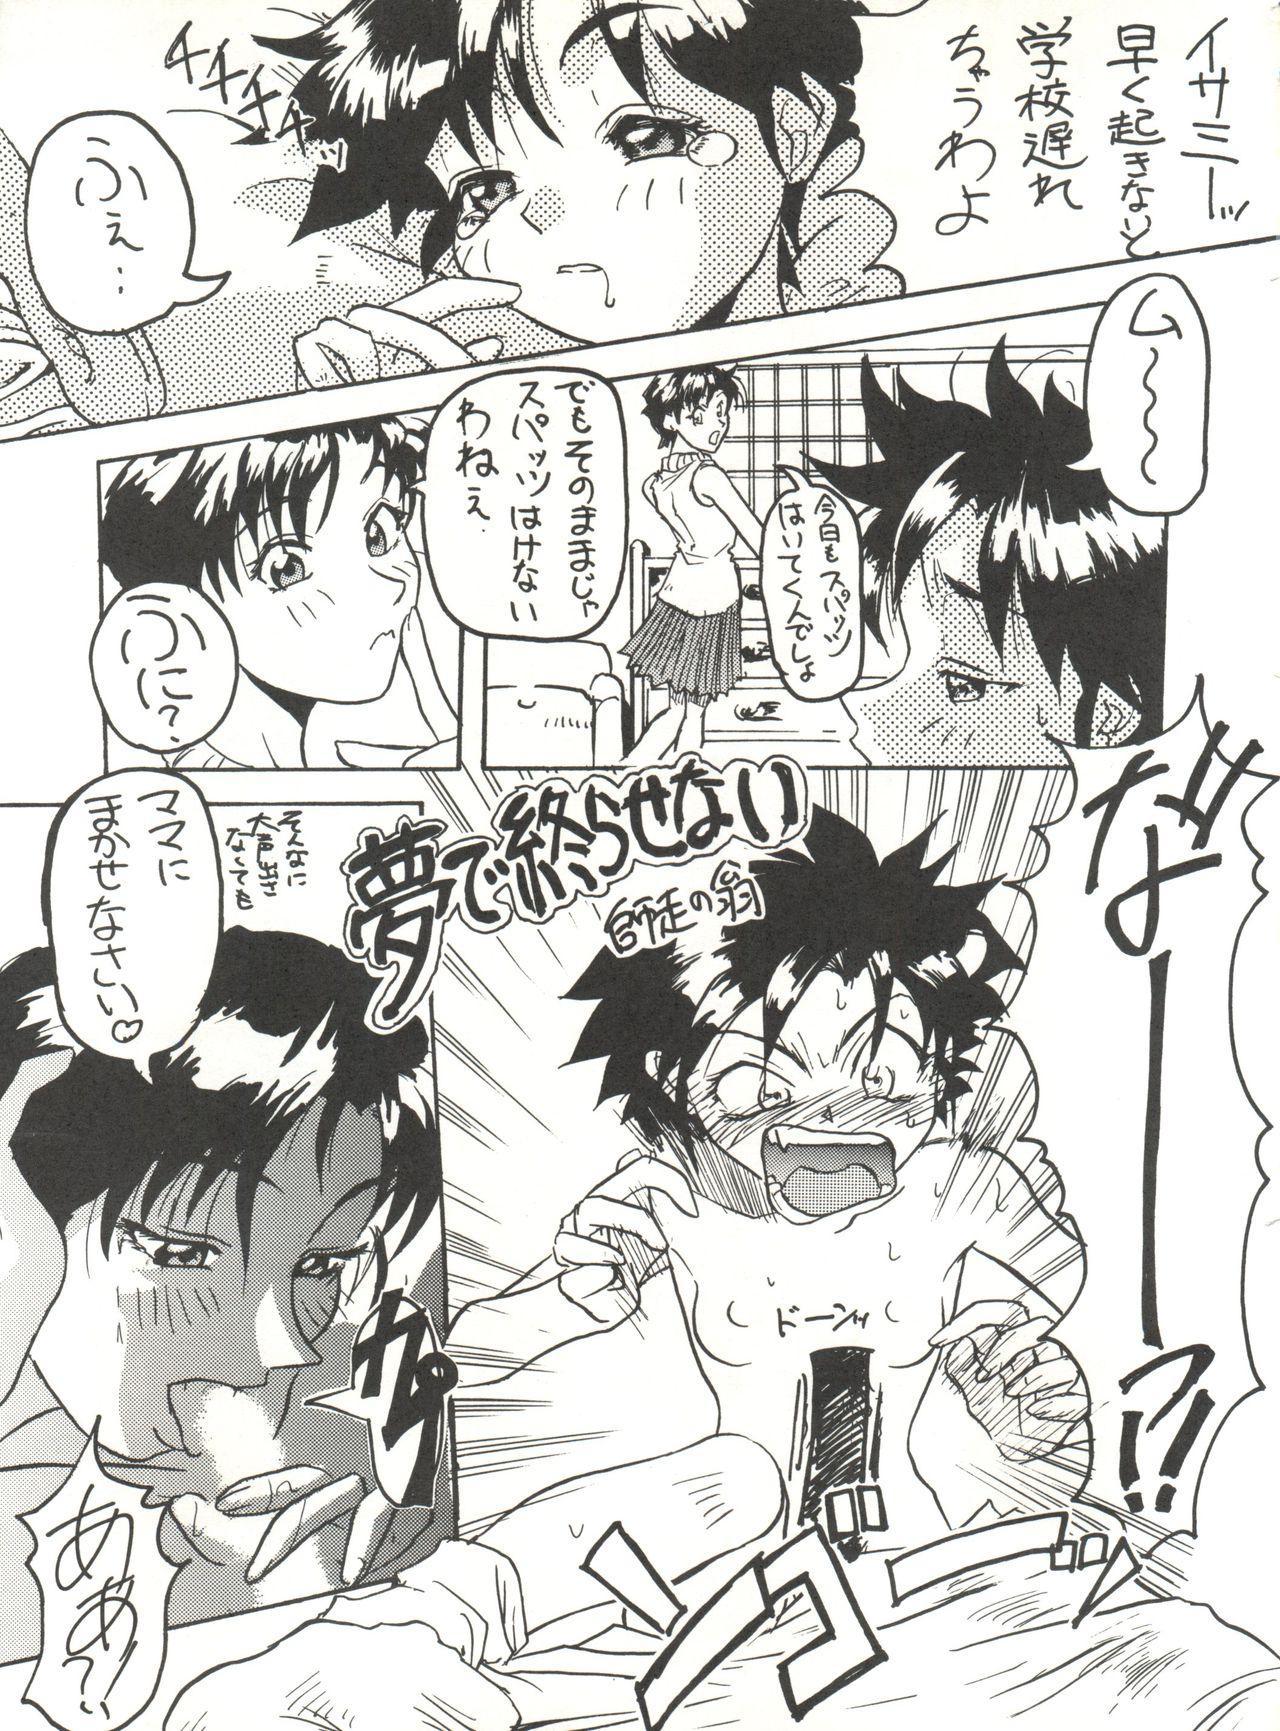 Heart o Migakukkya Nai 56